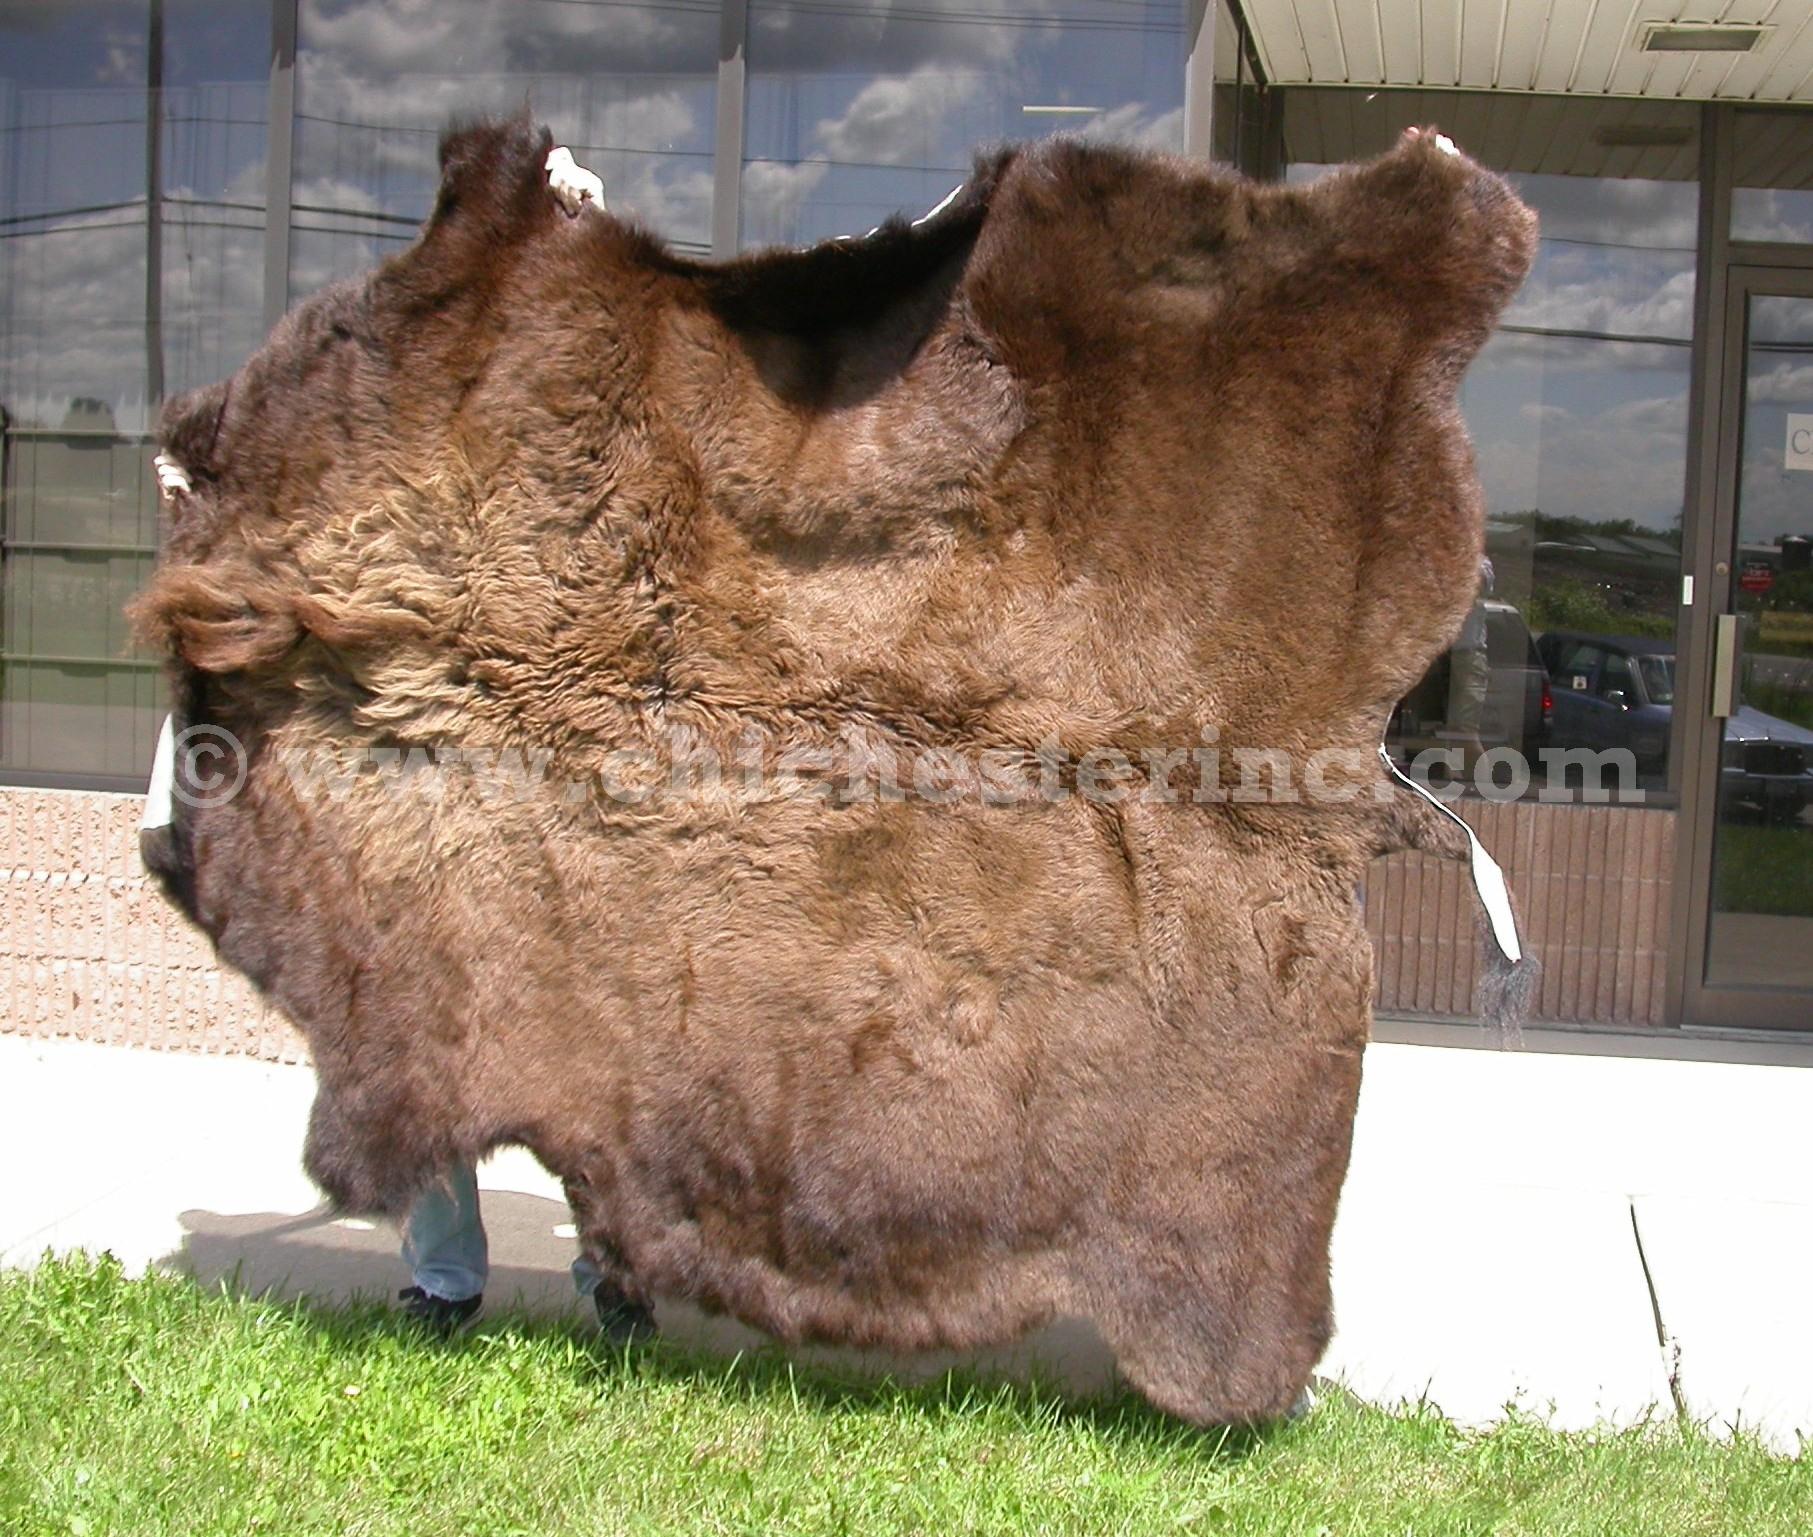 Buffalo Hides Or Buffalo Skins Or Buffalo Robes Or Tanned